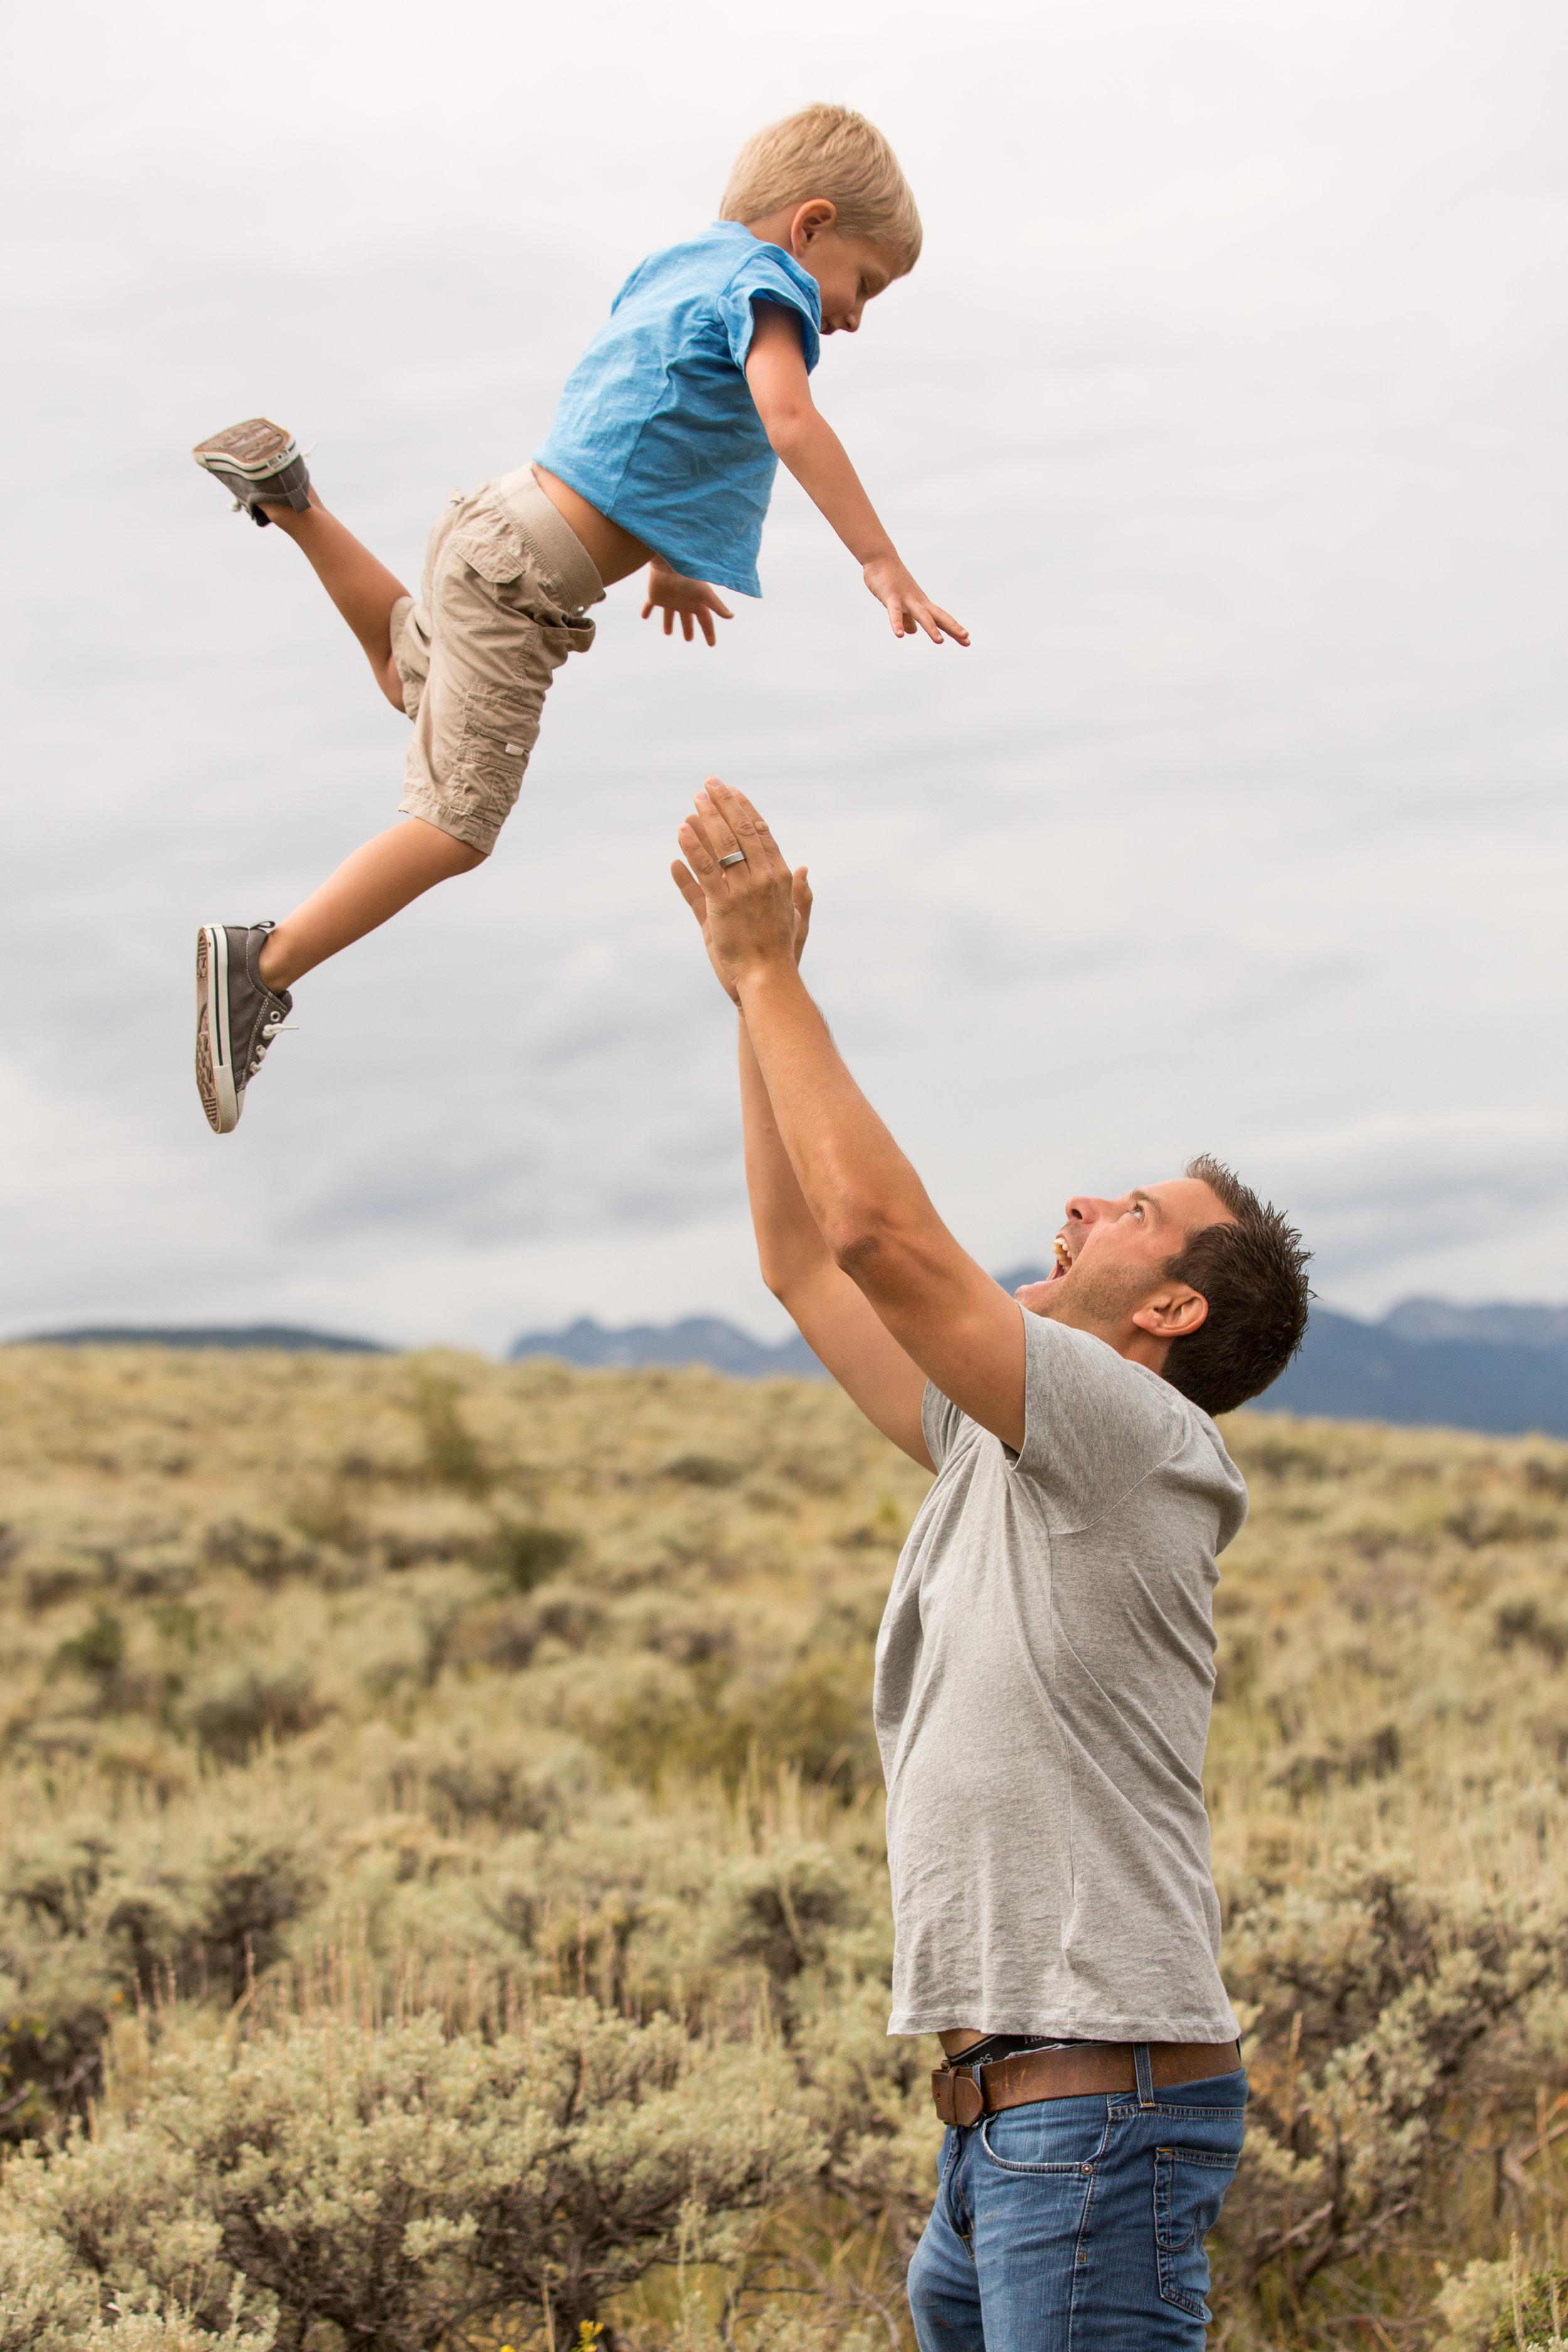 childrens-photography-vail-Axelphoto.jpg